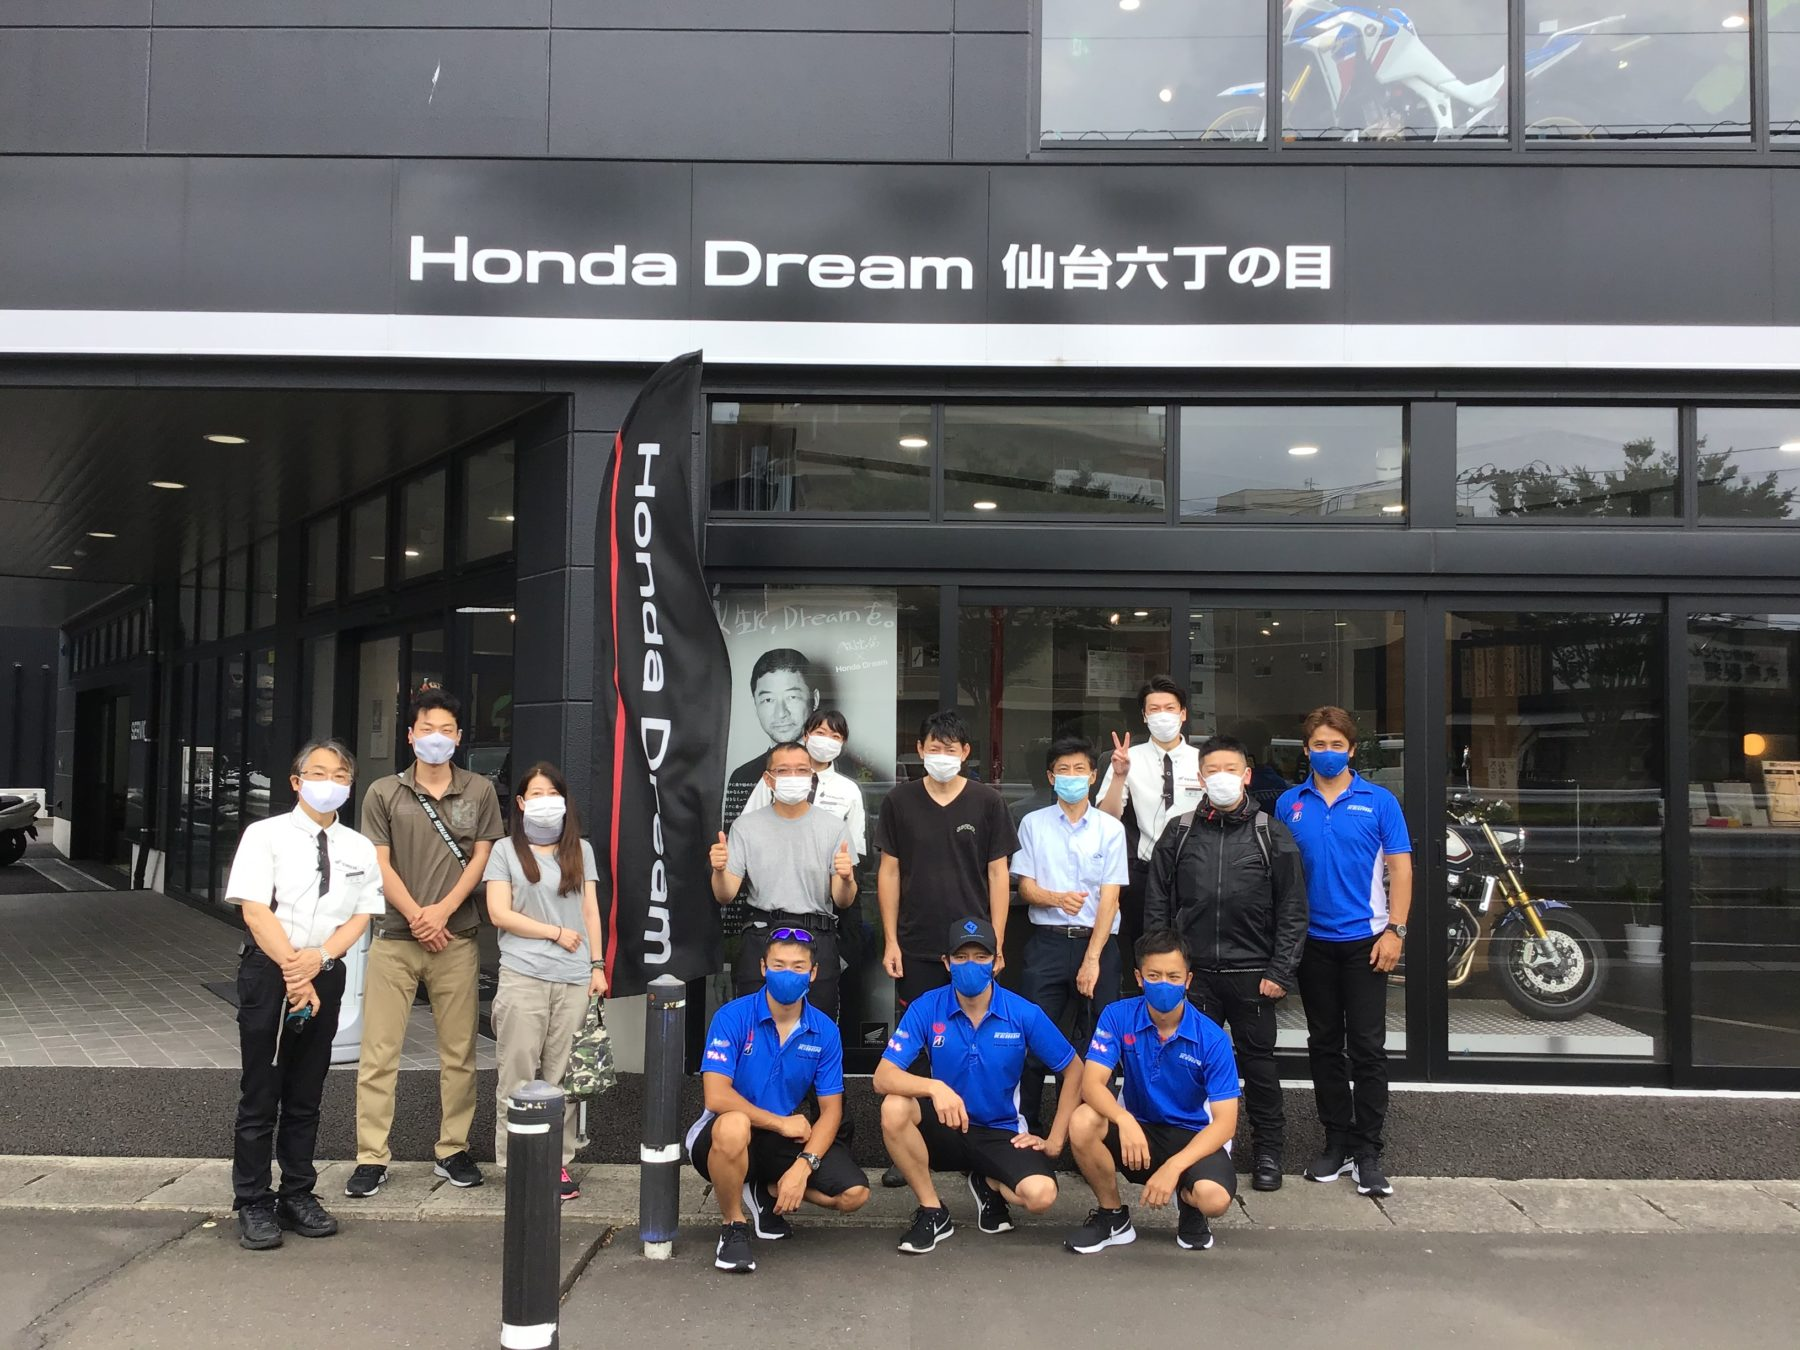 Keihin Honda Dream SIR